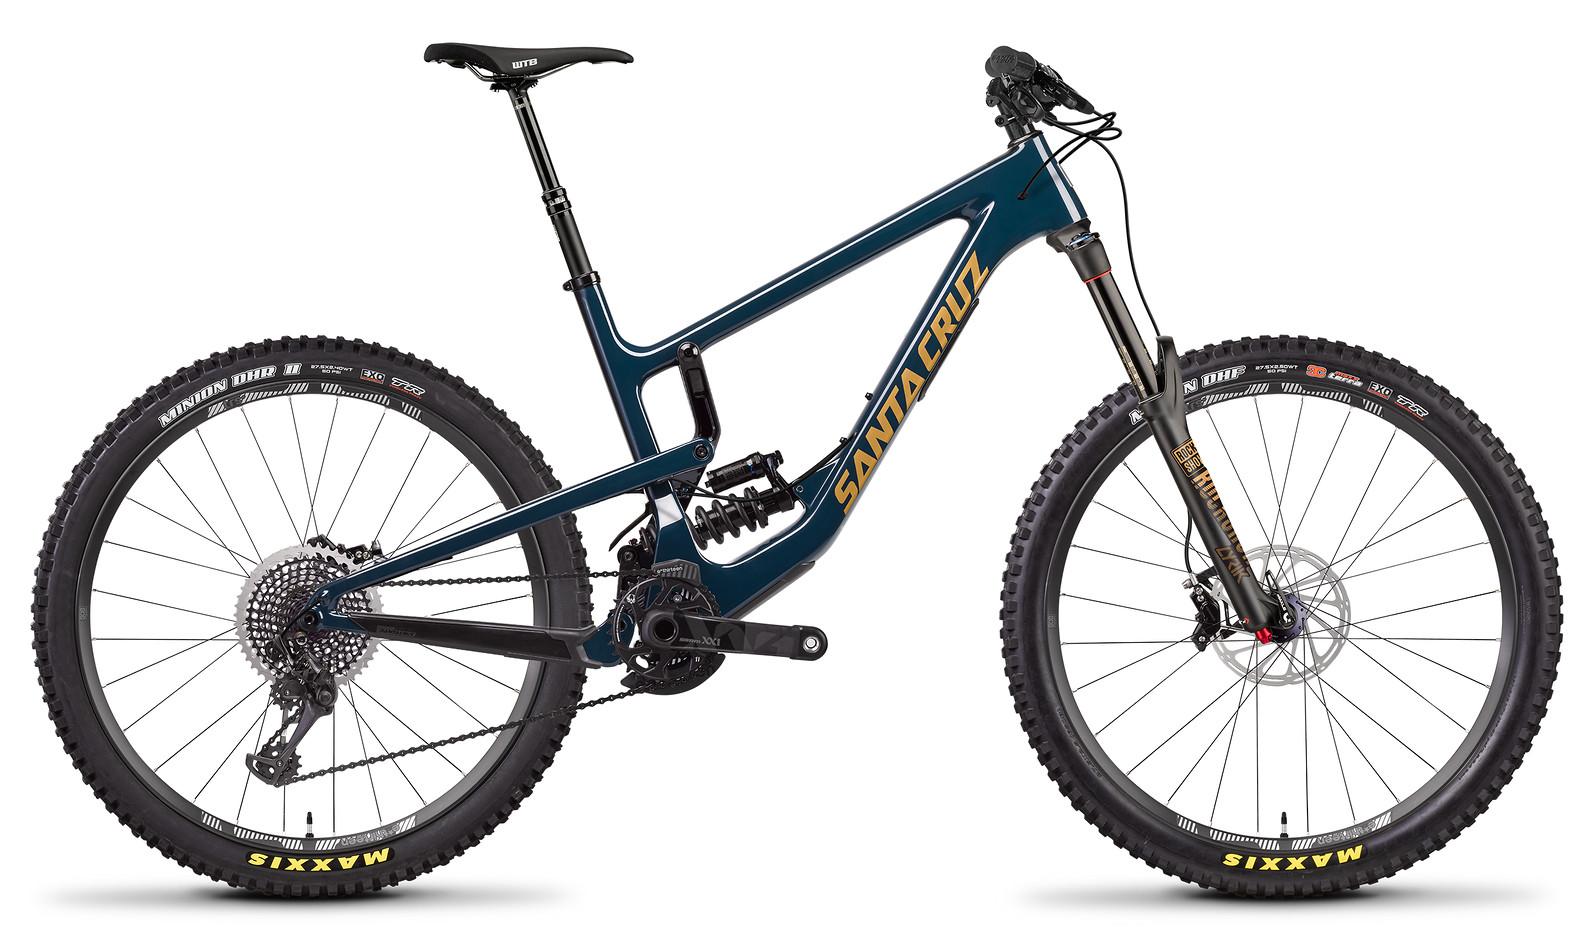 Santa Cruz 2018 Bikes >> 2018 Santa Cruz Nomad Carbon CC XX1 Reserve - Reviews, Comparisons, Specs - Mountain Bikes ...